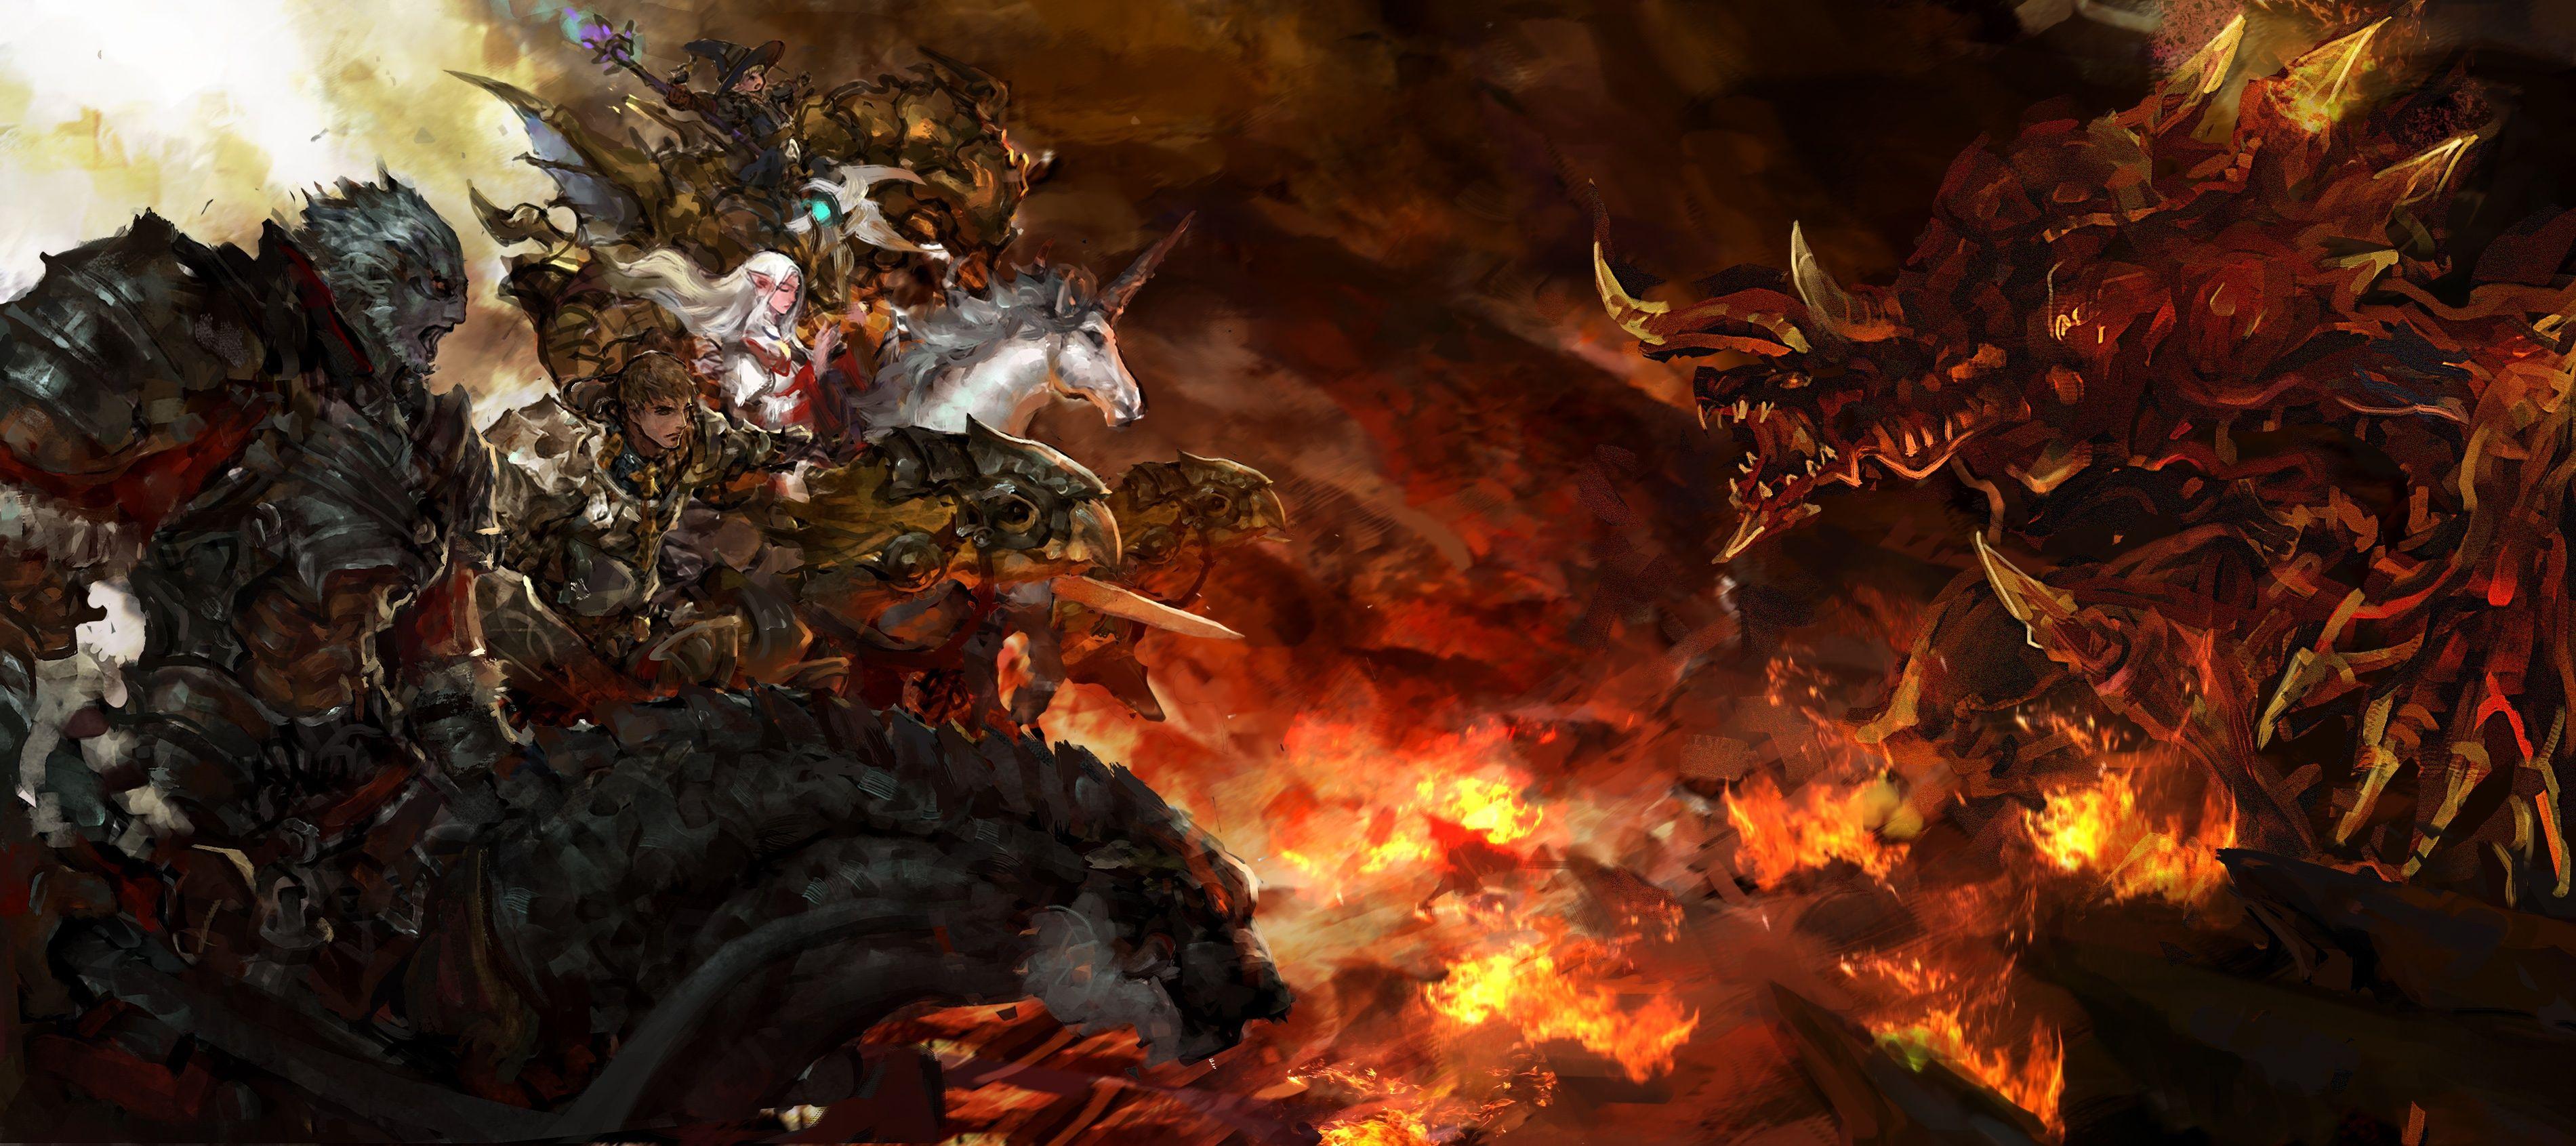 Wallpaper Wallpaper From Final Fantasy Xiv A Realm Reborn